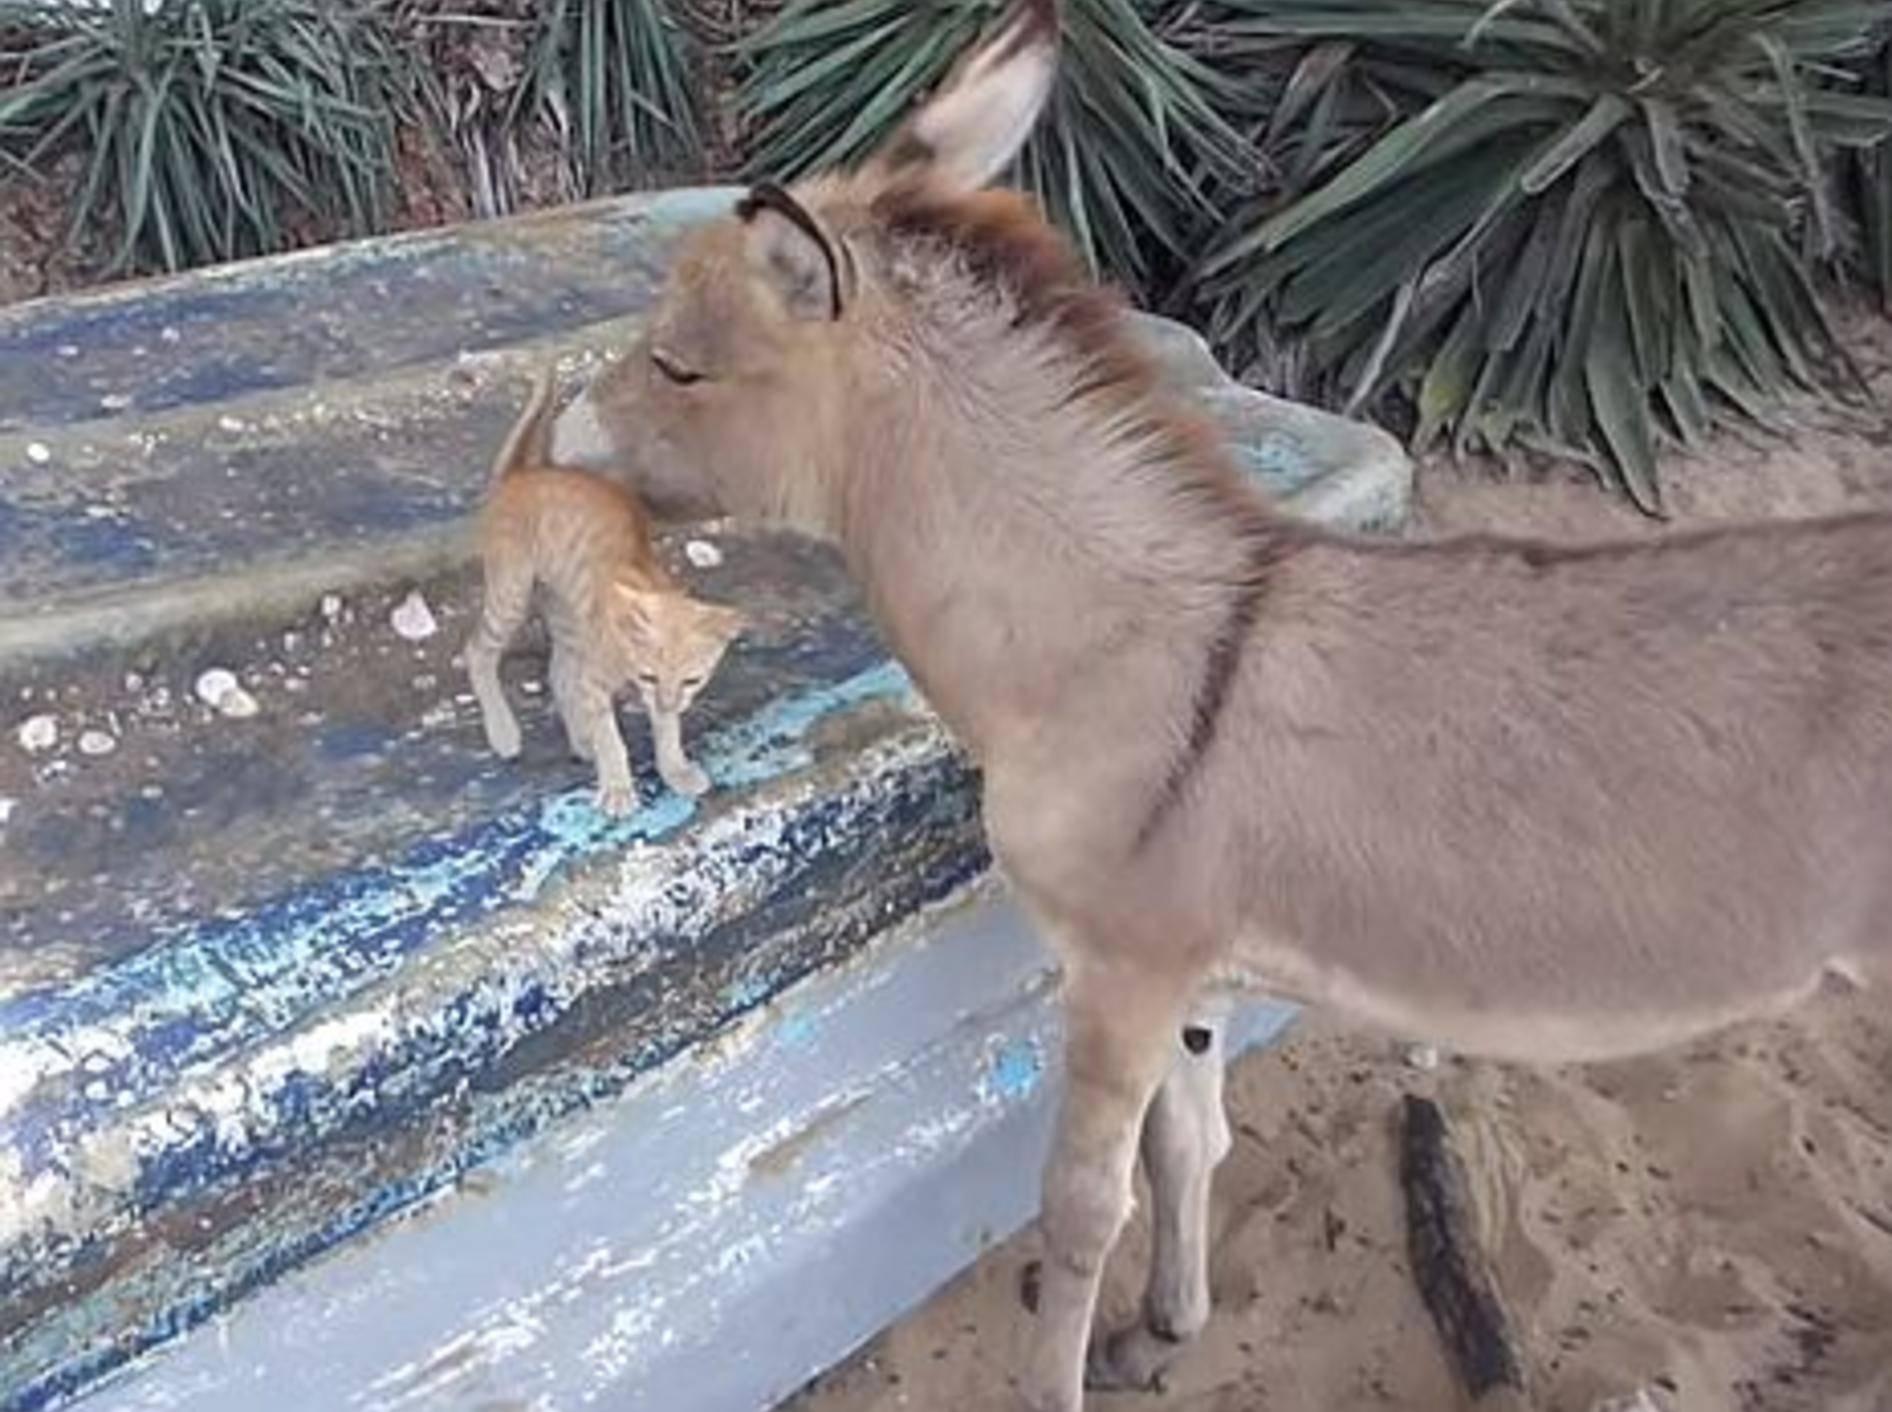 Kuschelalarm bei Esel und Katzenbaby – Bild: Youtube / Johnny Bomblast